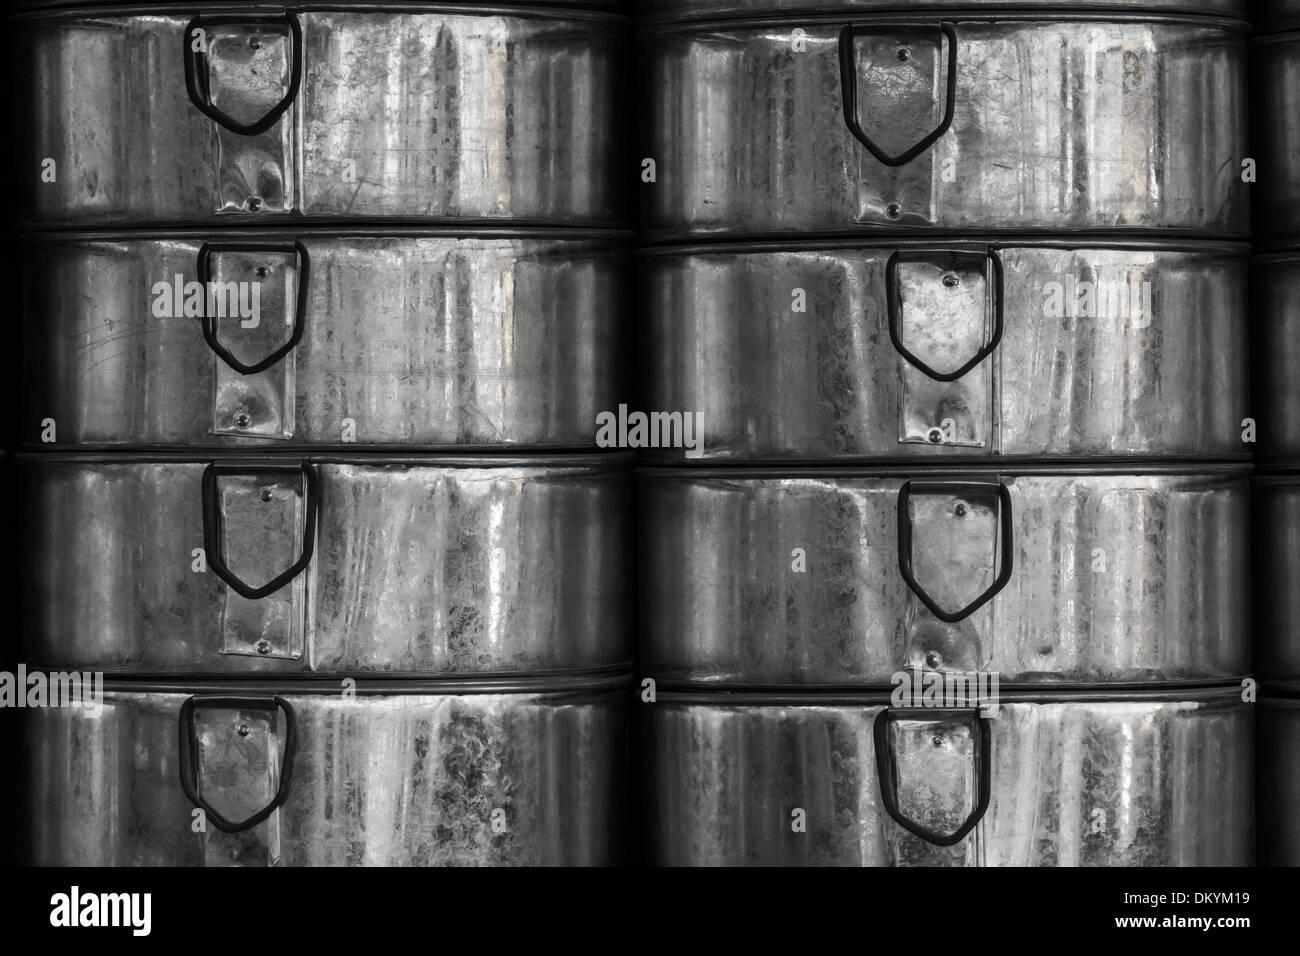 India, Rajasthan, Naguar, galvanized sheet metal contaniners - Stock Image